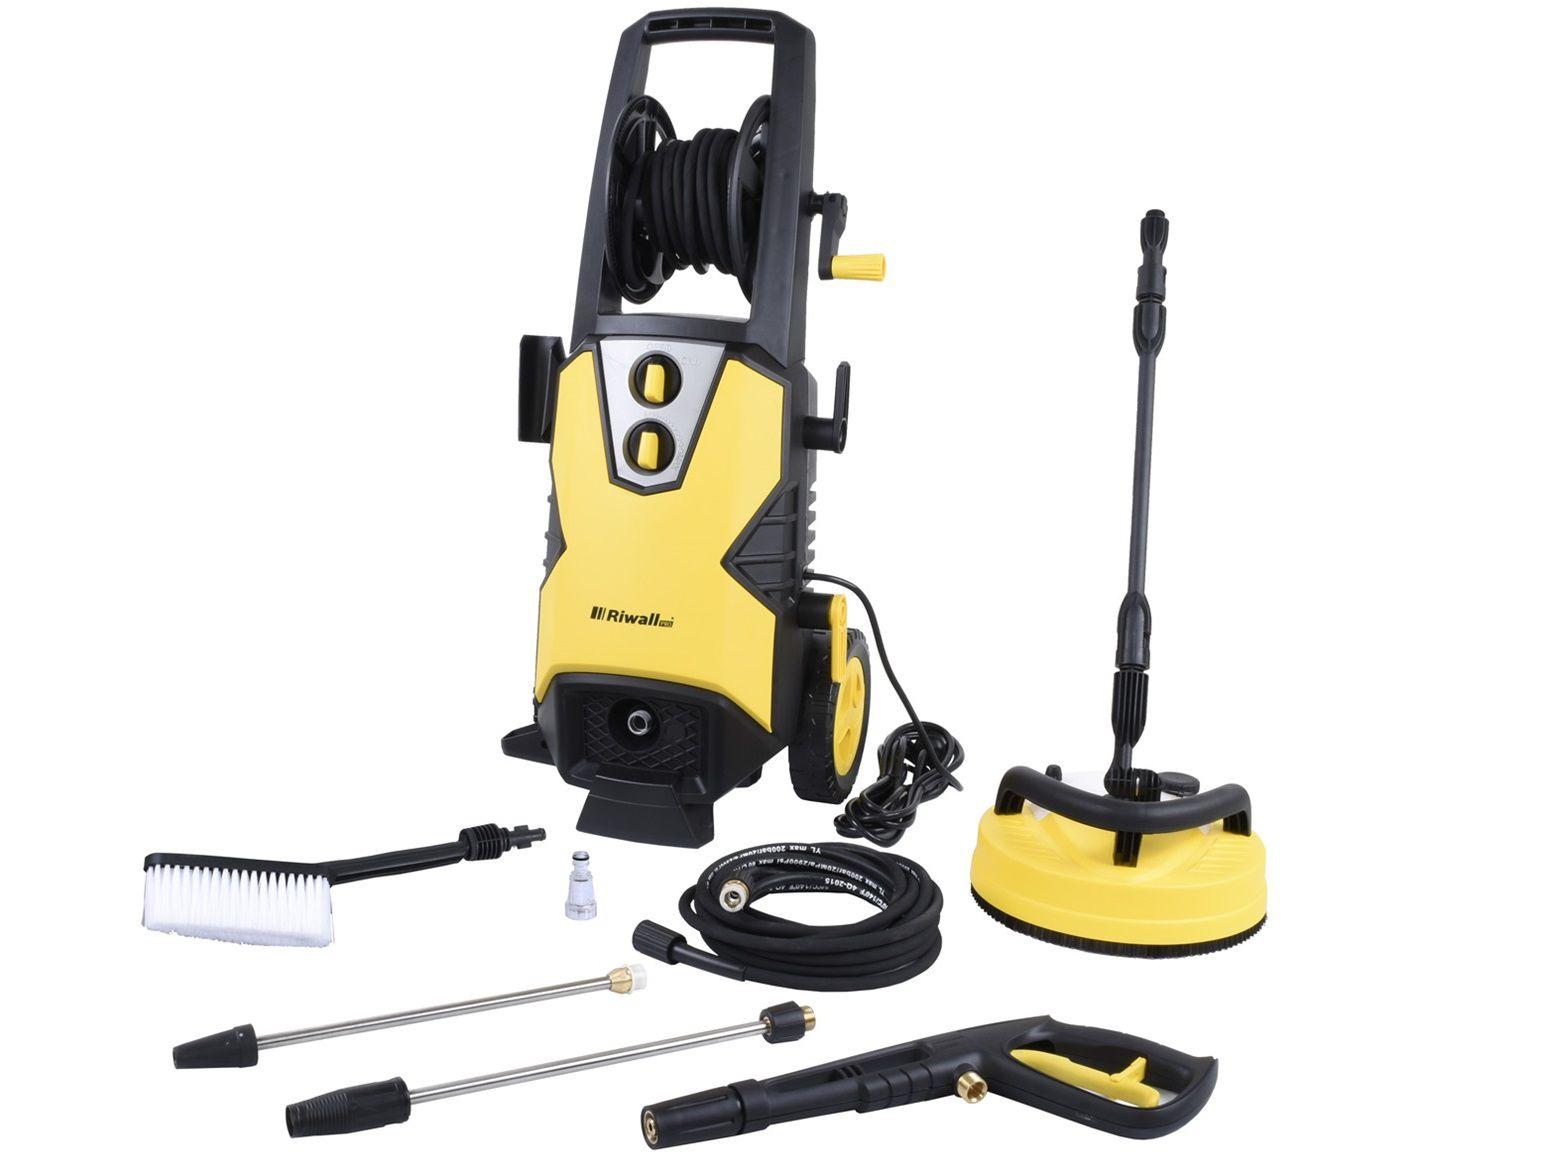 Vysokotlaký čistič Riwall REPW 170 SET - 2500W, 170bar, 468l/h, 22.4kg, kód: EP25A1501069B